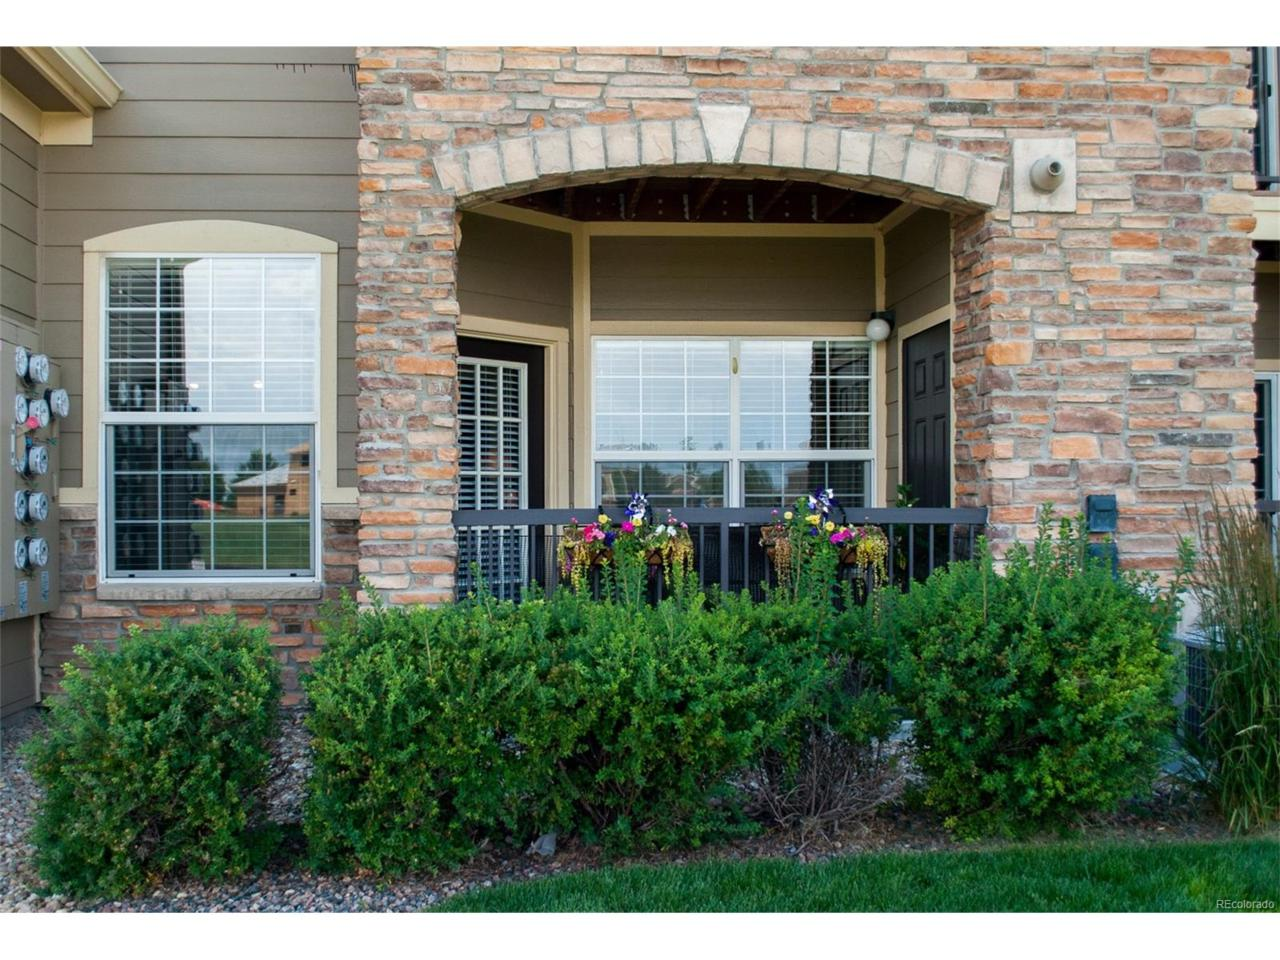 3095 Blue Sky Circle #104, Erie, CO 80516 (MLS #6878268) :: 8z Real Estate